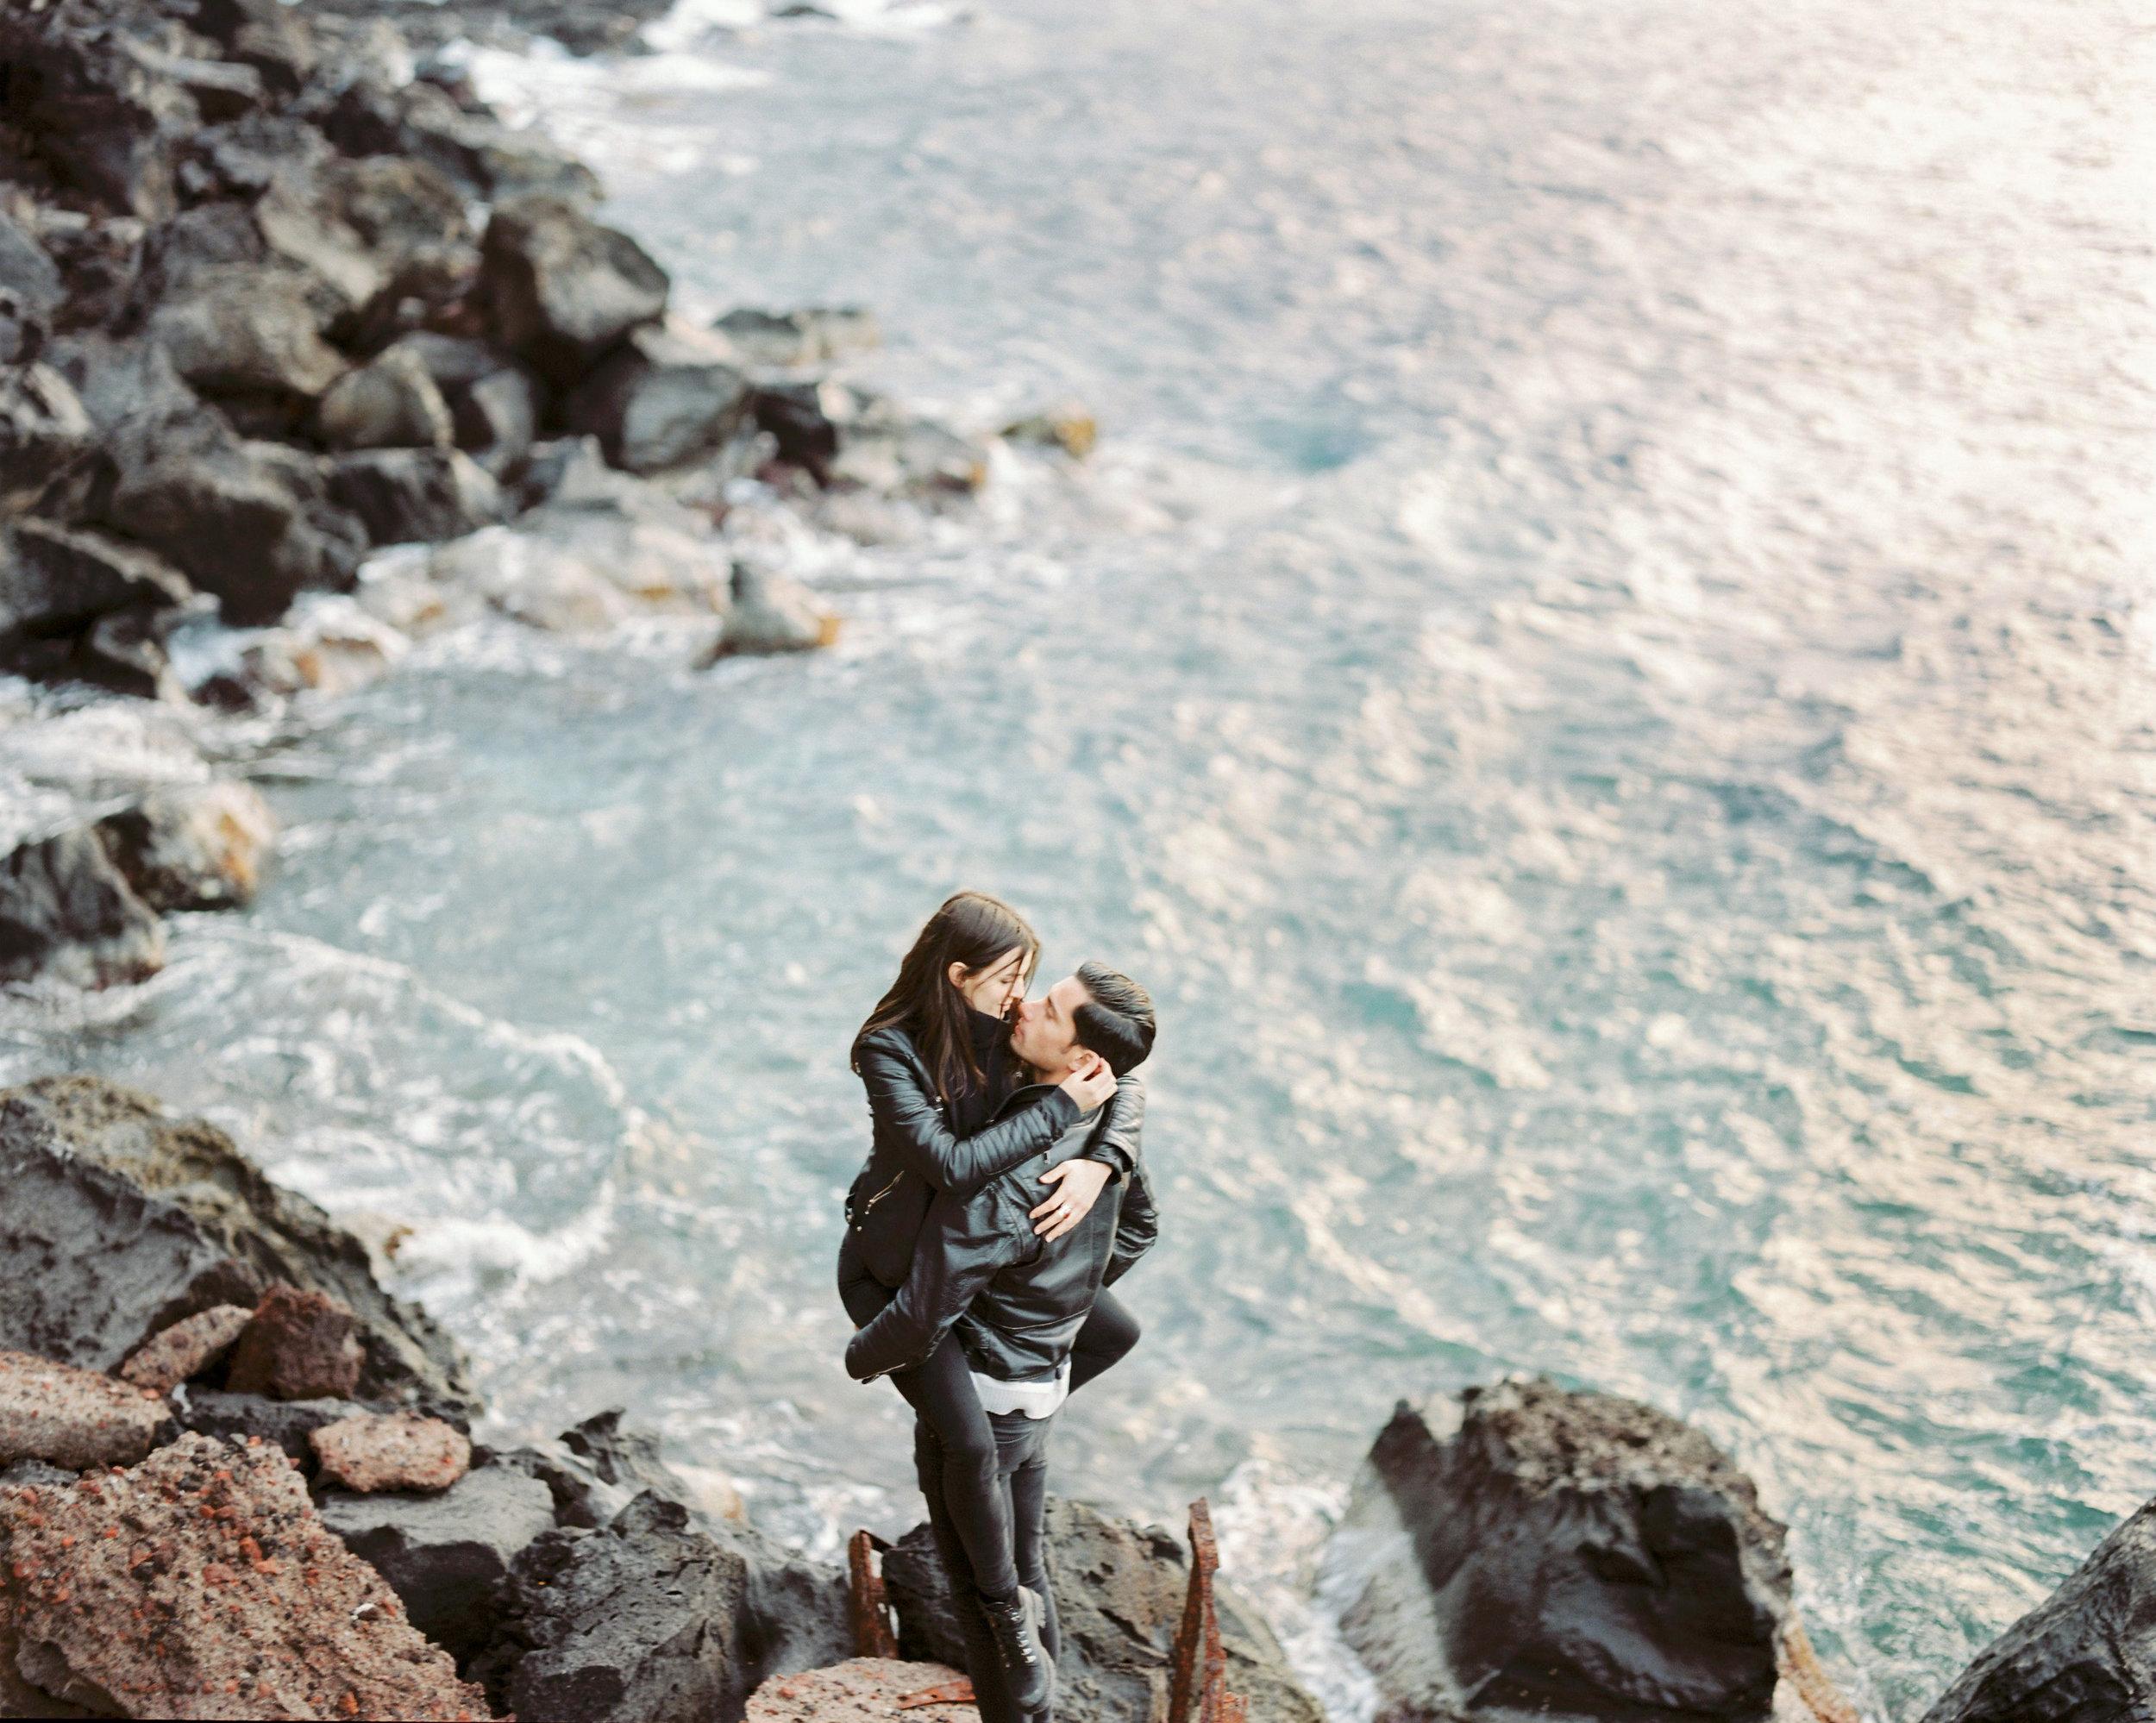 celinehamelin-photographe-couple-argentique-loversession-grece-santorin-argentique-filmphotography-greece10.jpg